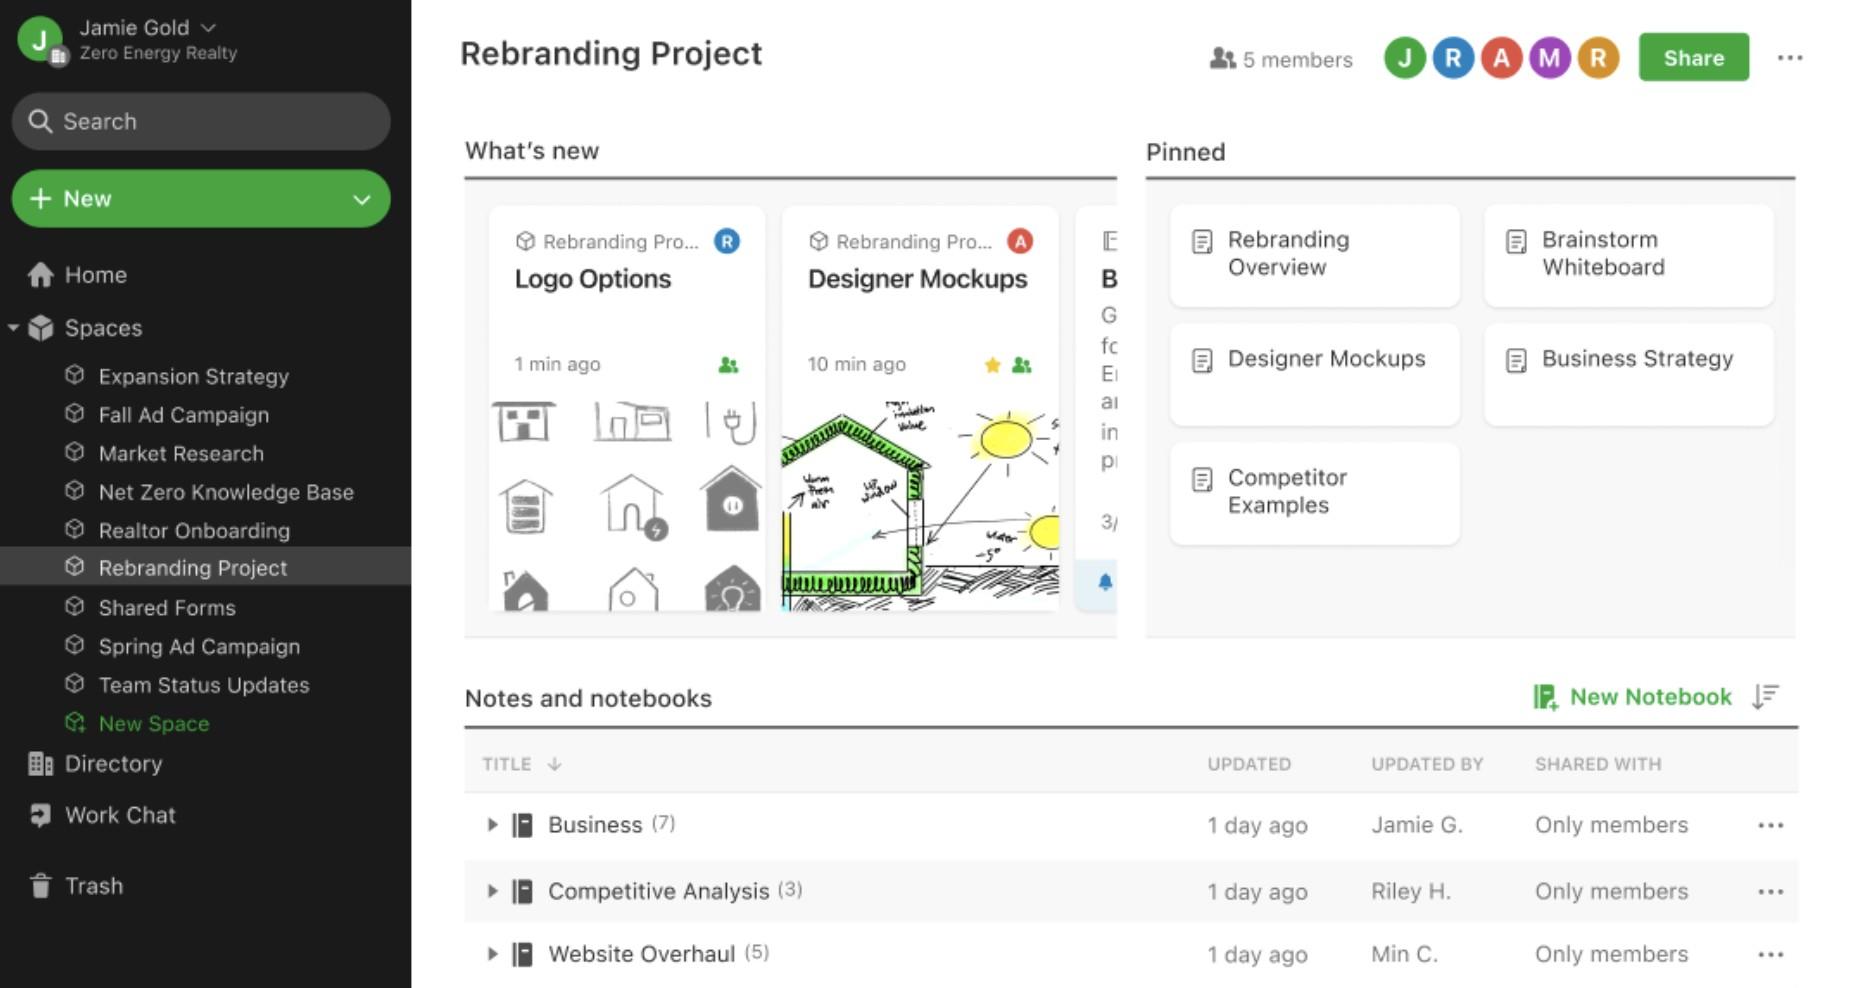 evernote teams marketing collaboration tool